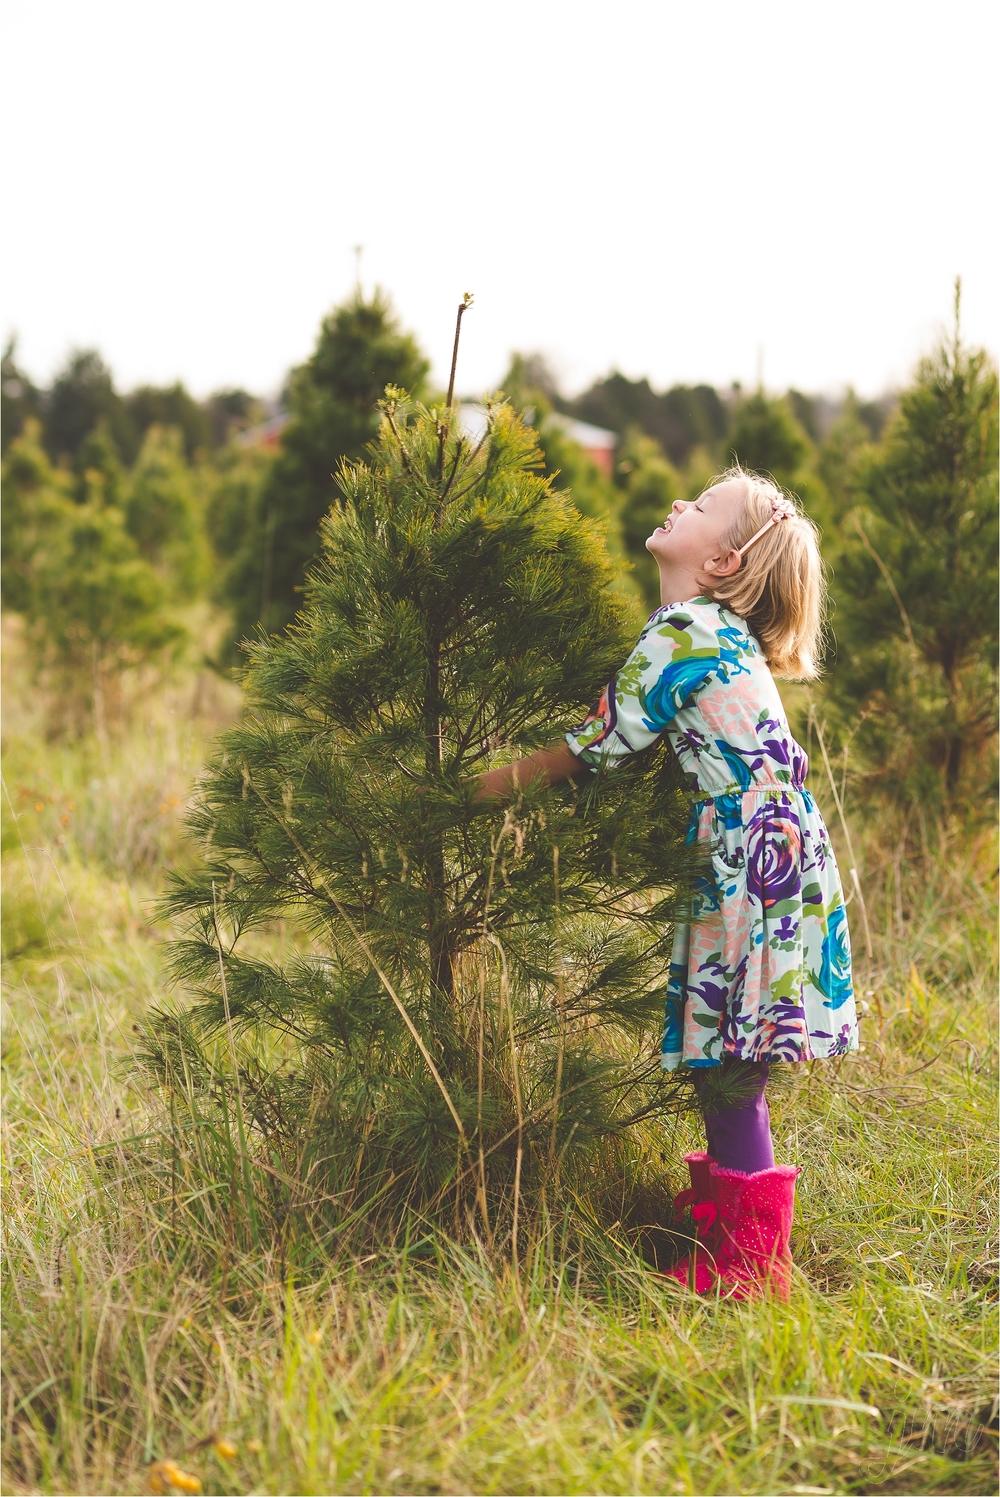 christmas-tree-farm-session-pnw-jannicka-mayte_0032.jpg